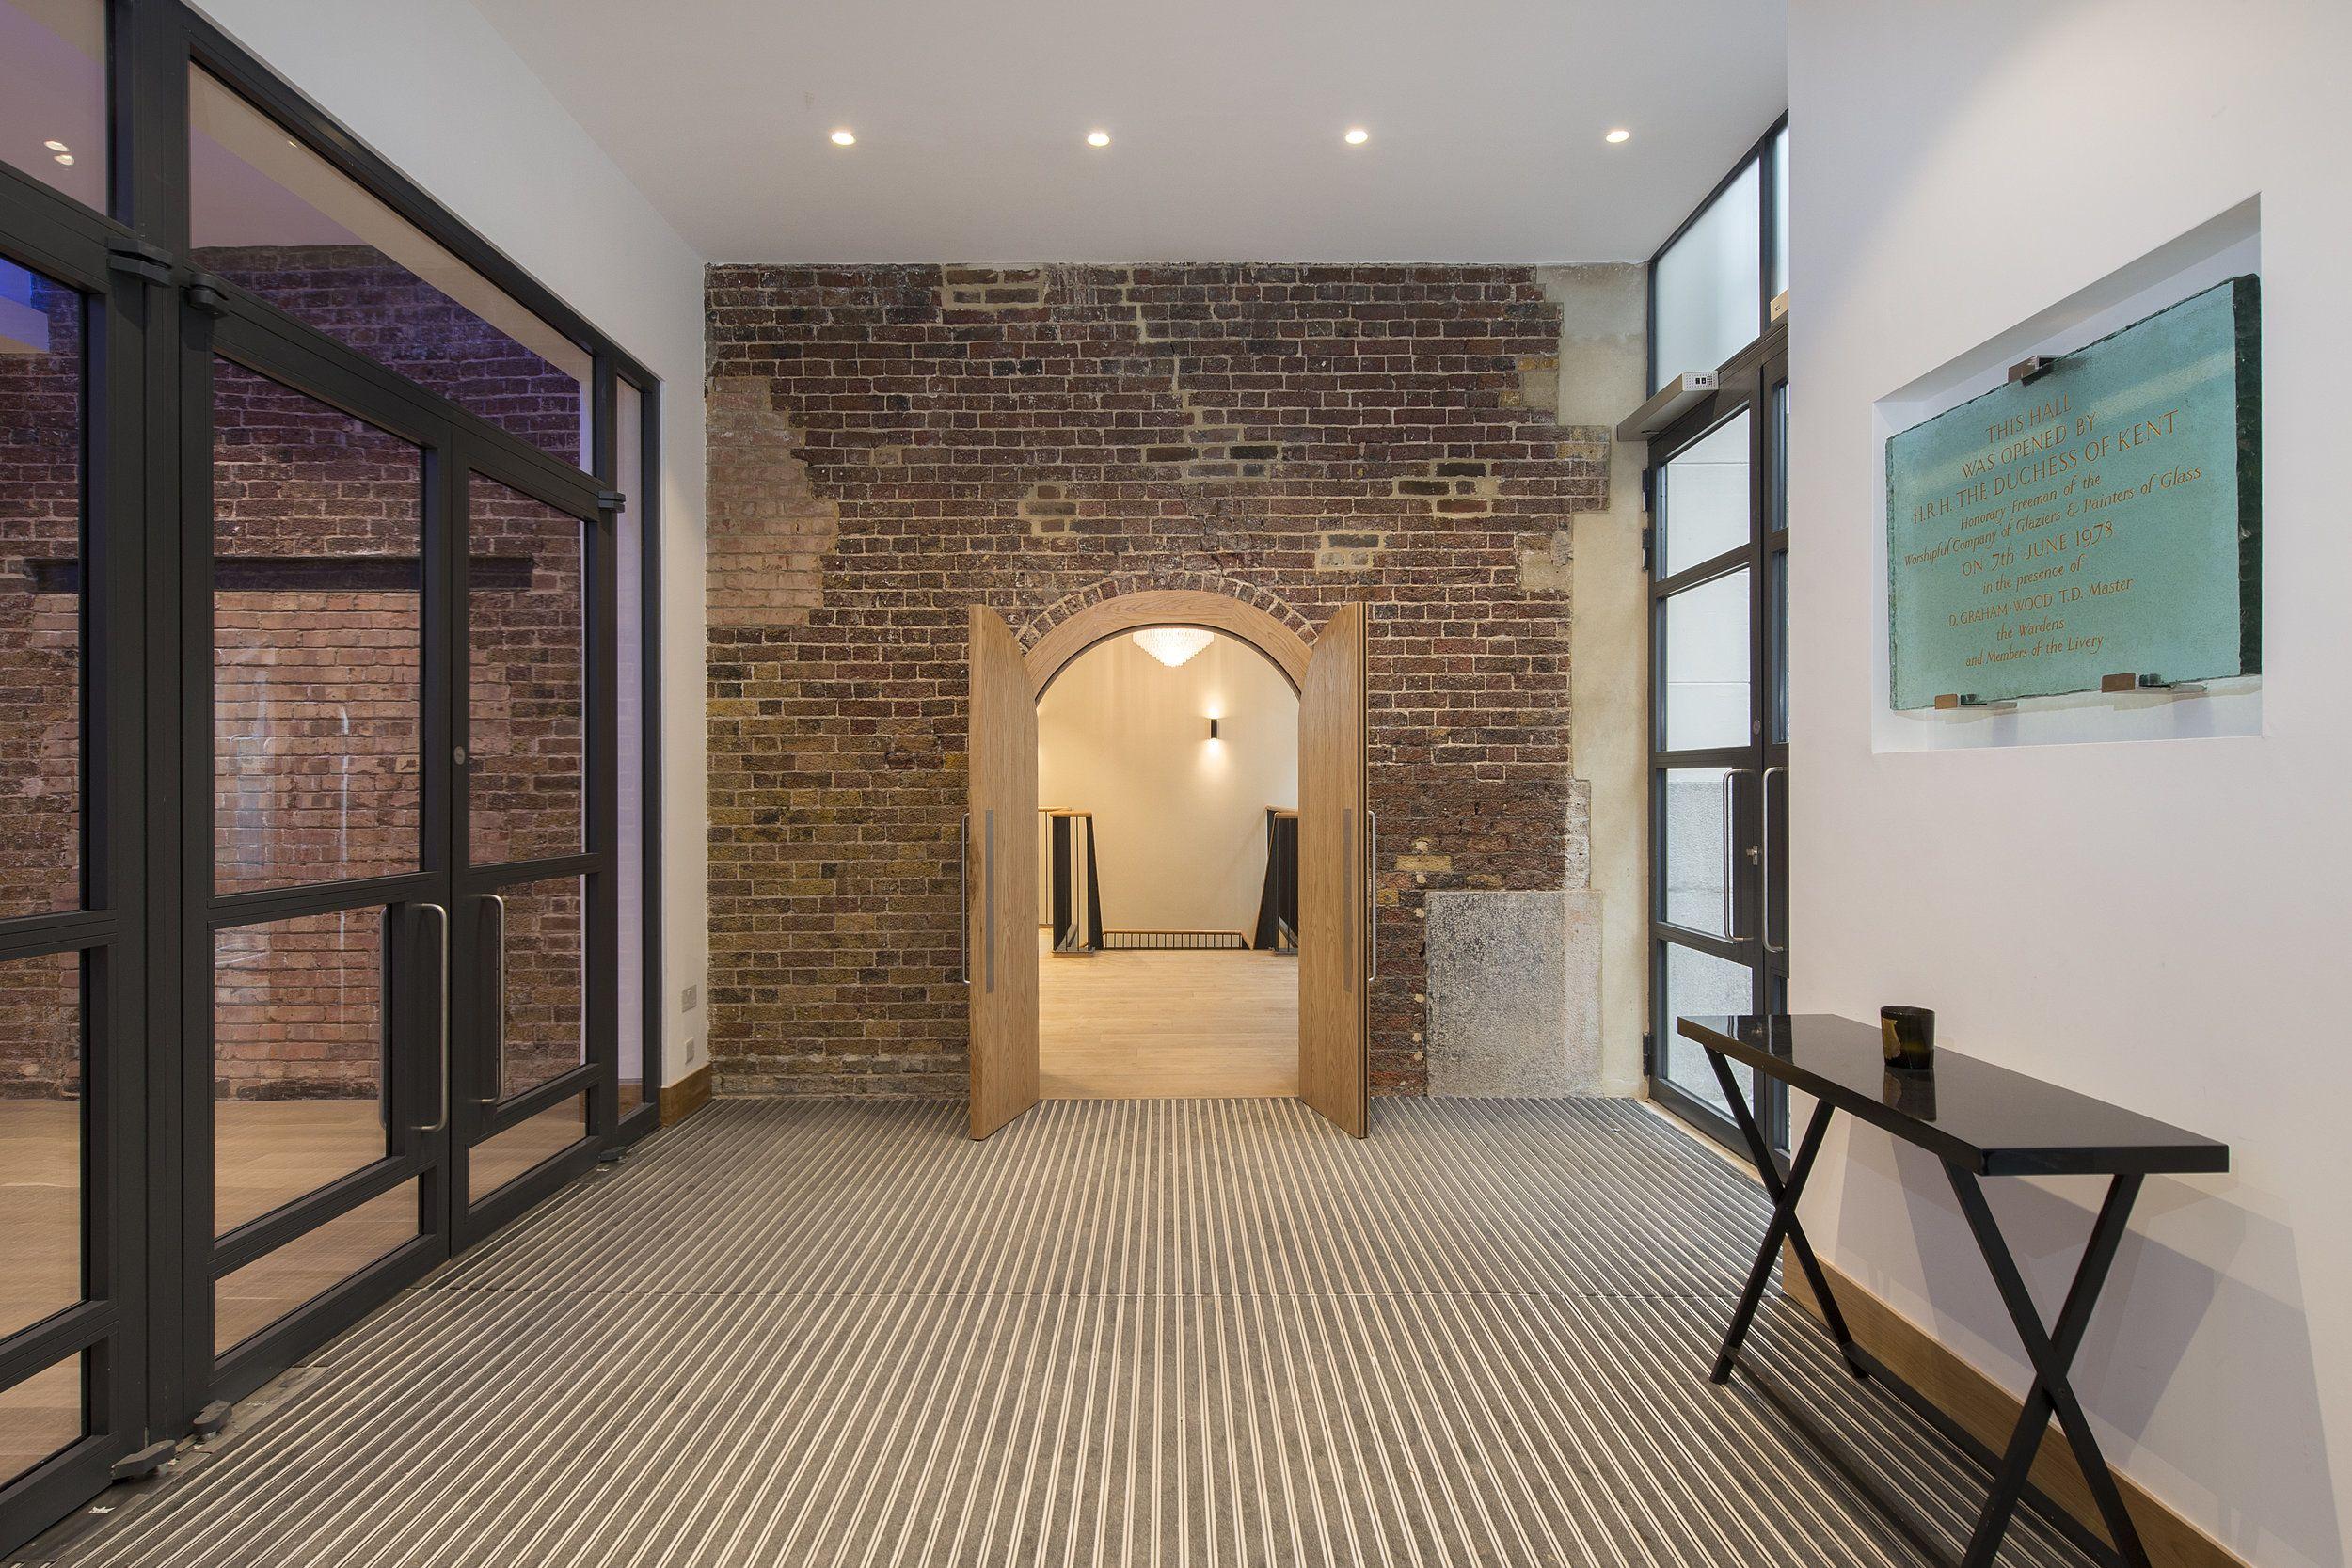 Entrance foyer | Entrance foyer, Entrance, Room divider